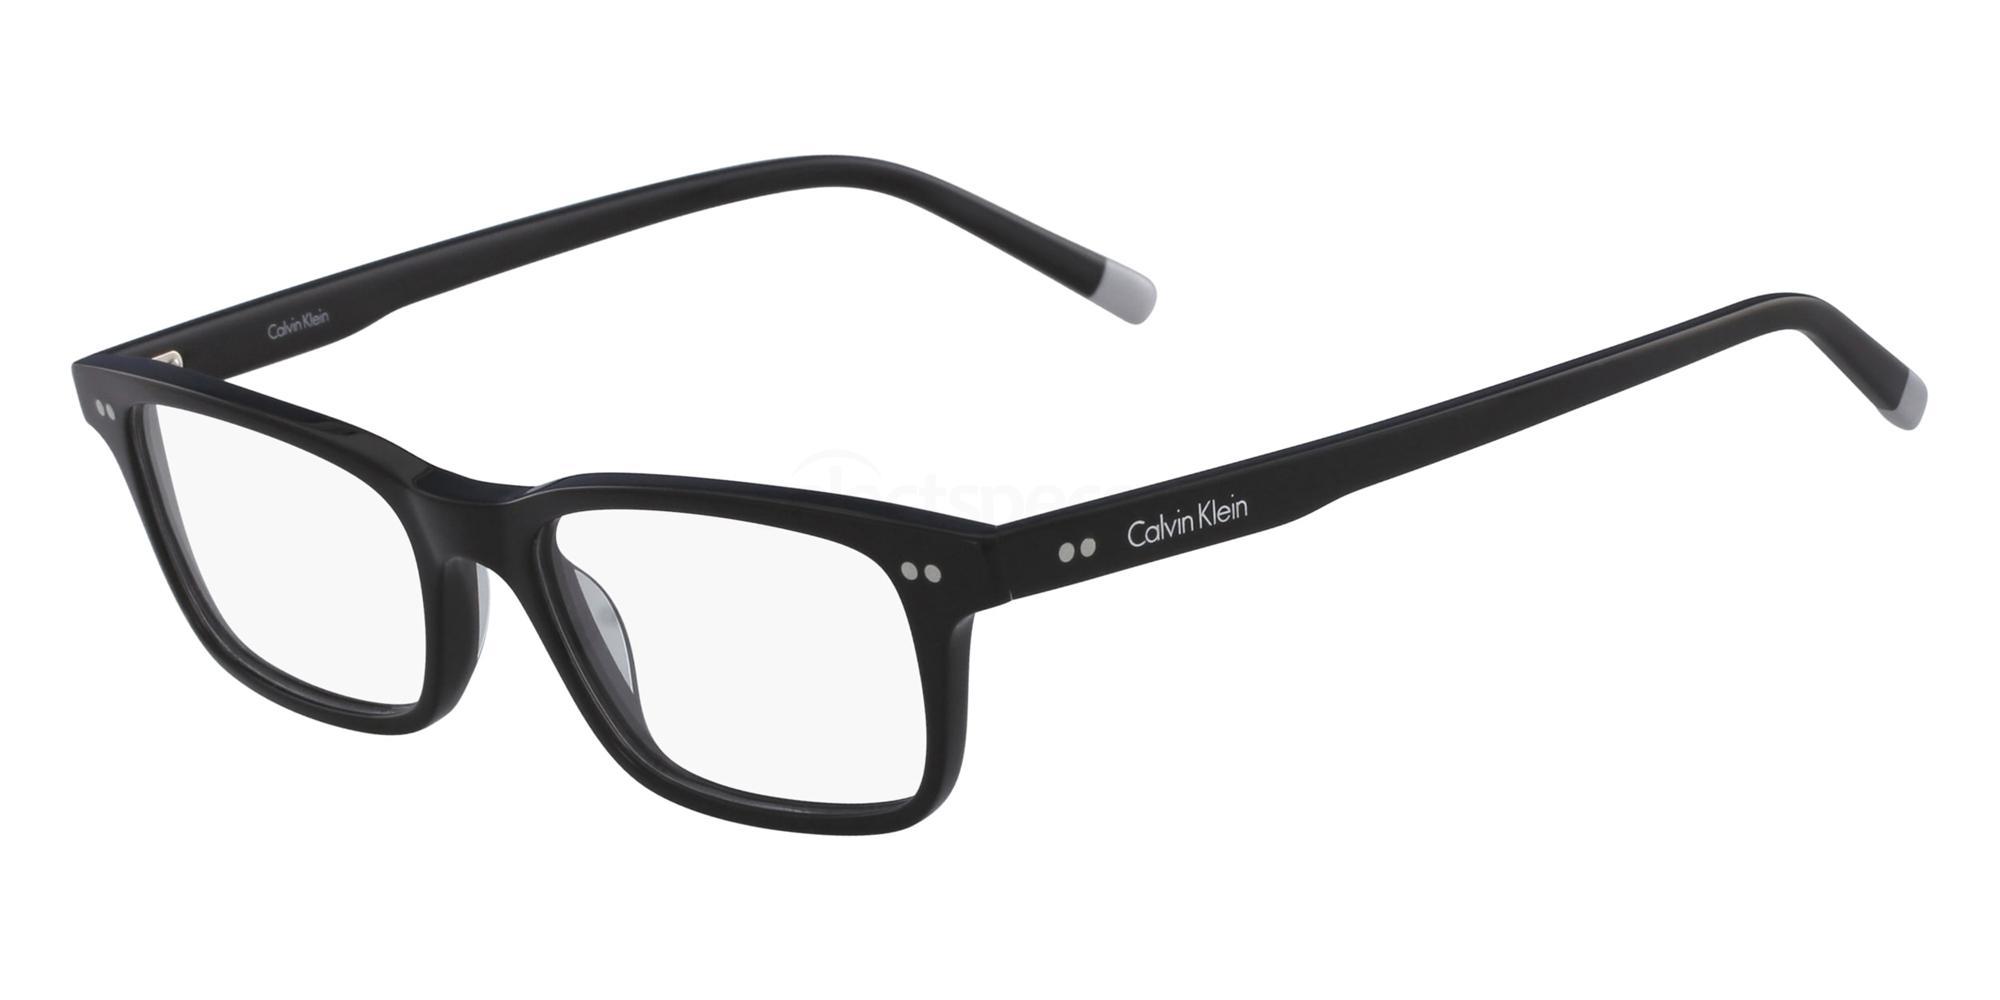 001 CK5989 Glasses, Calvin Klein